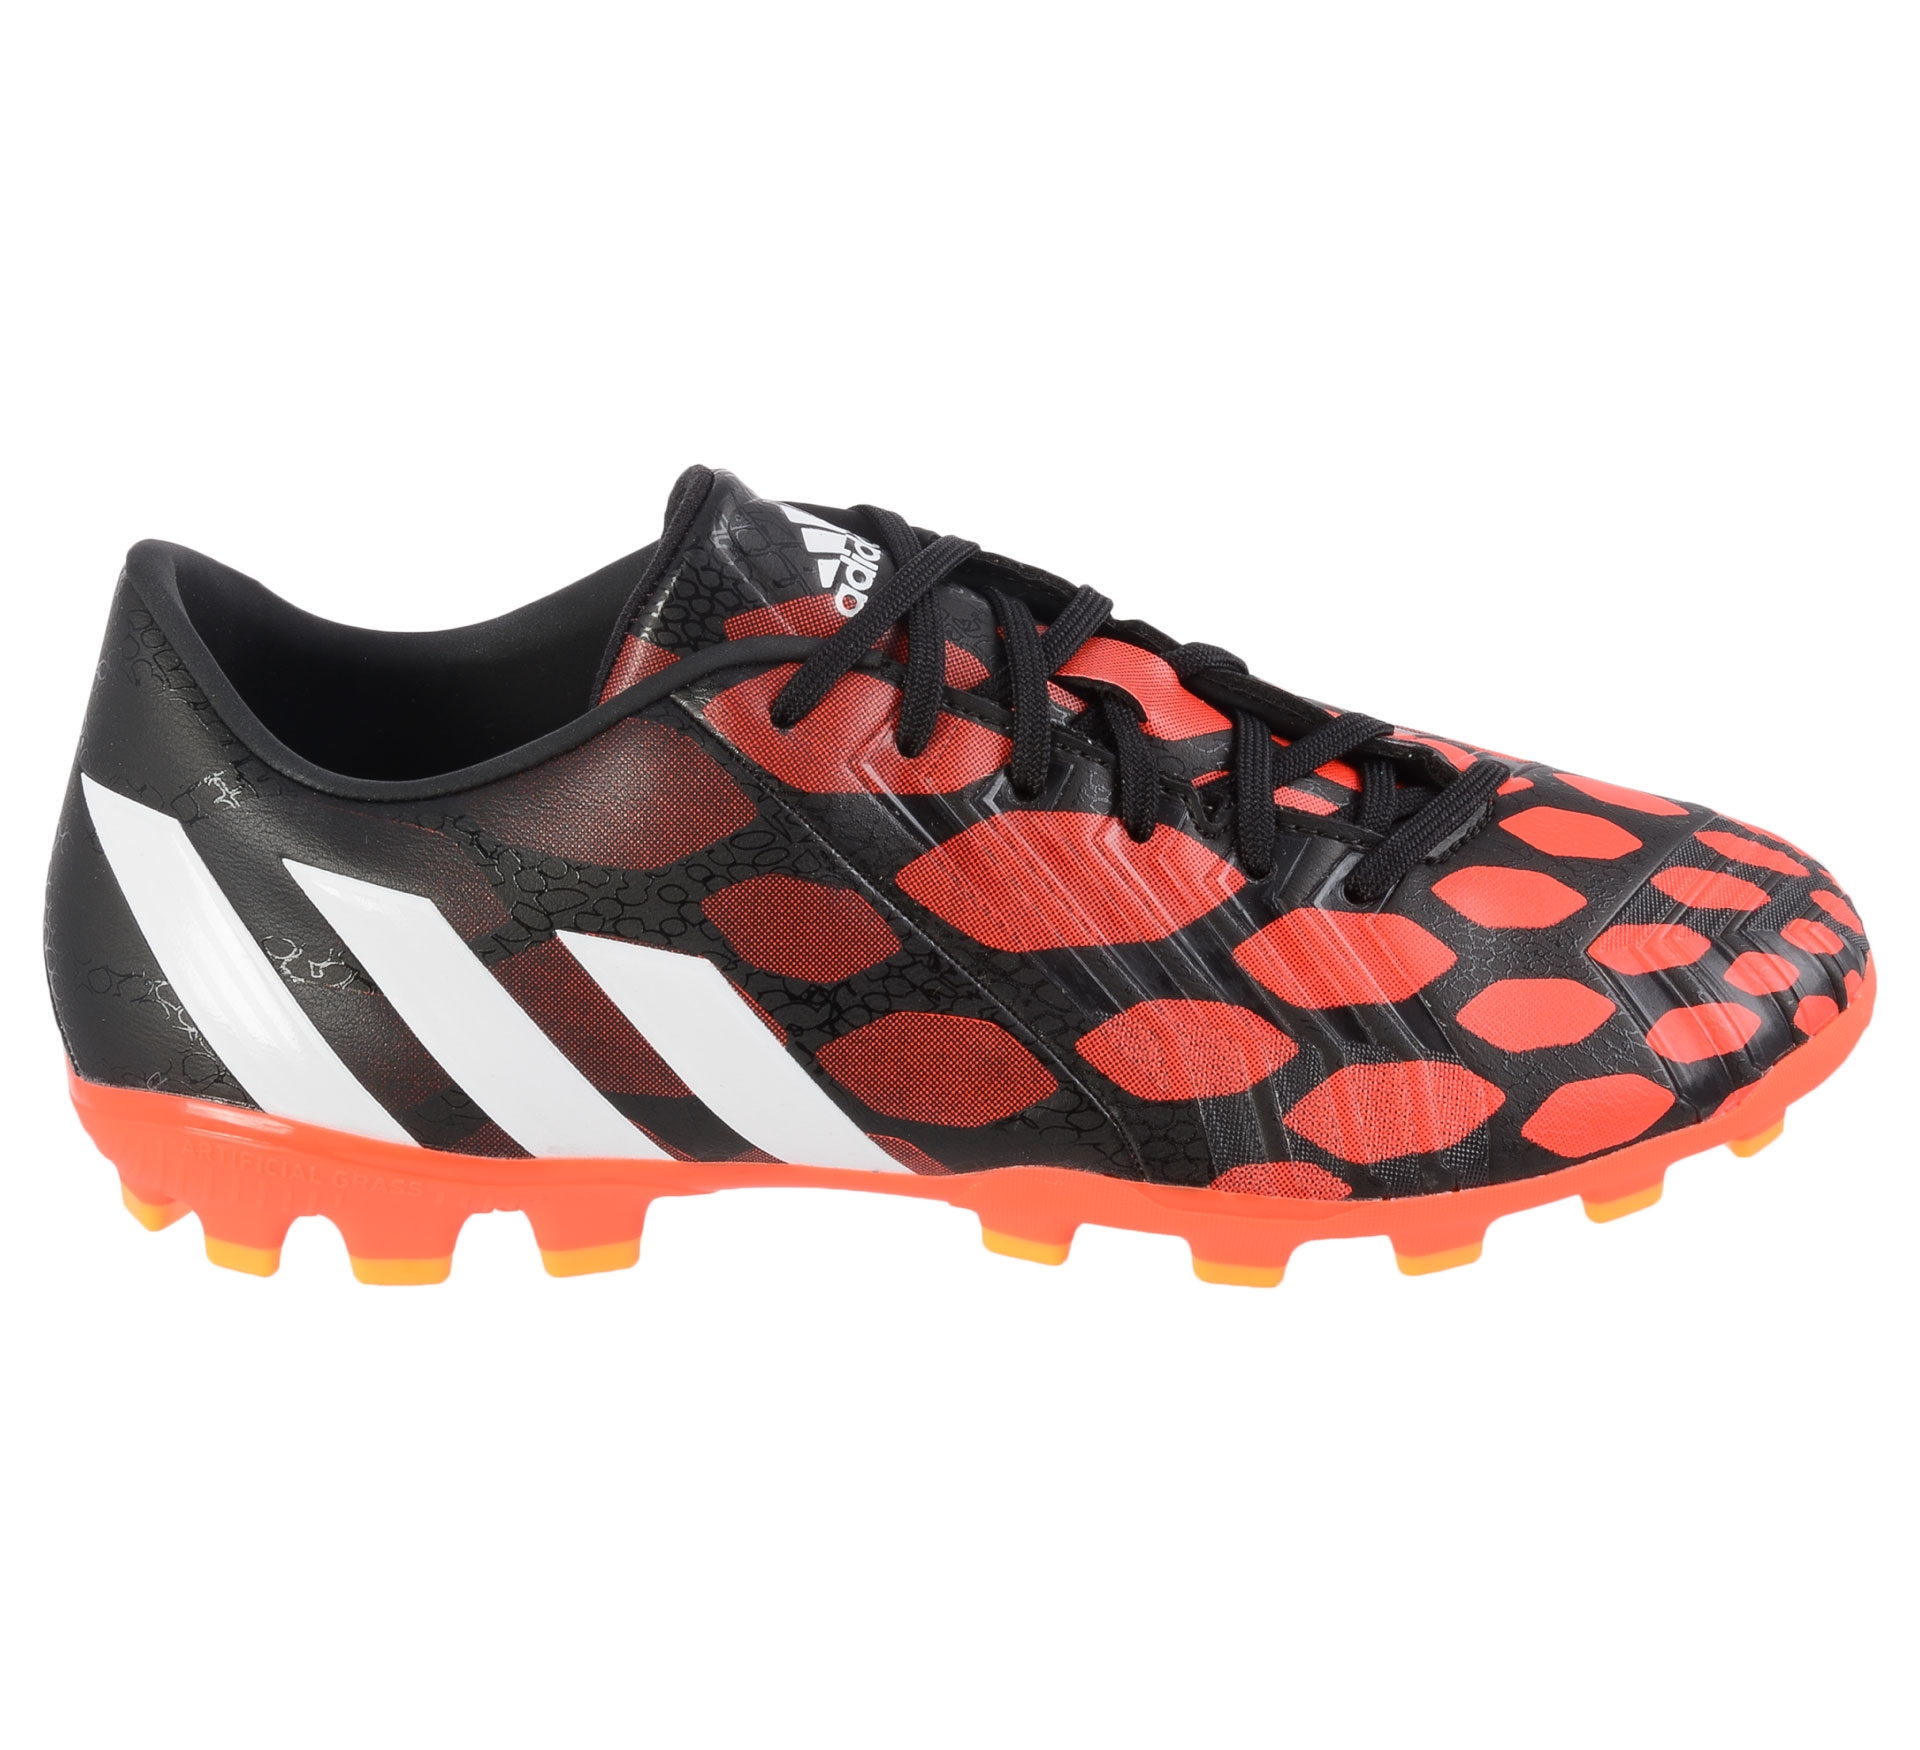 83324b67bf87 Adidas Predator Absolado Instinc... laagste prijs  Vergelijk het hier